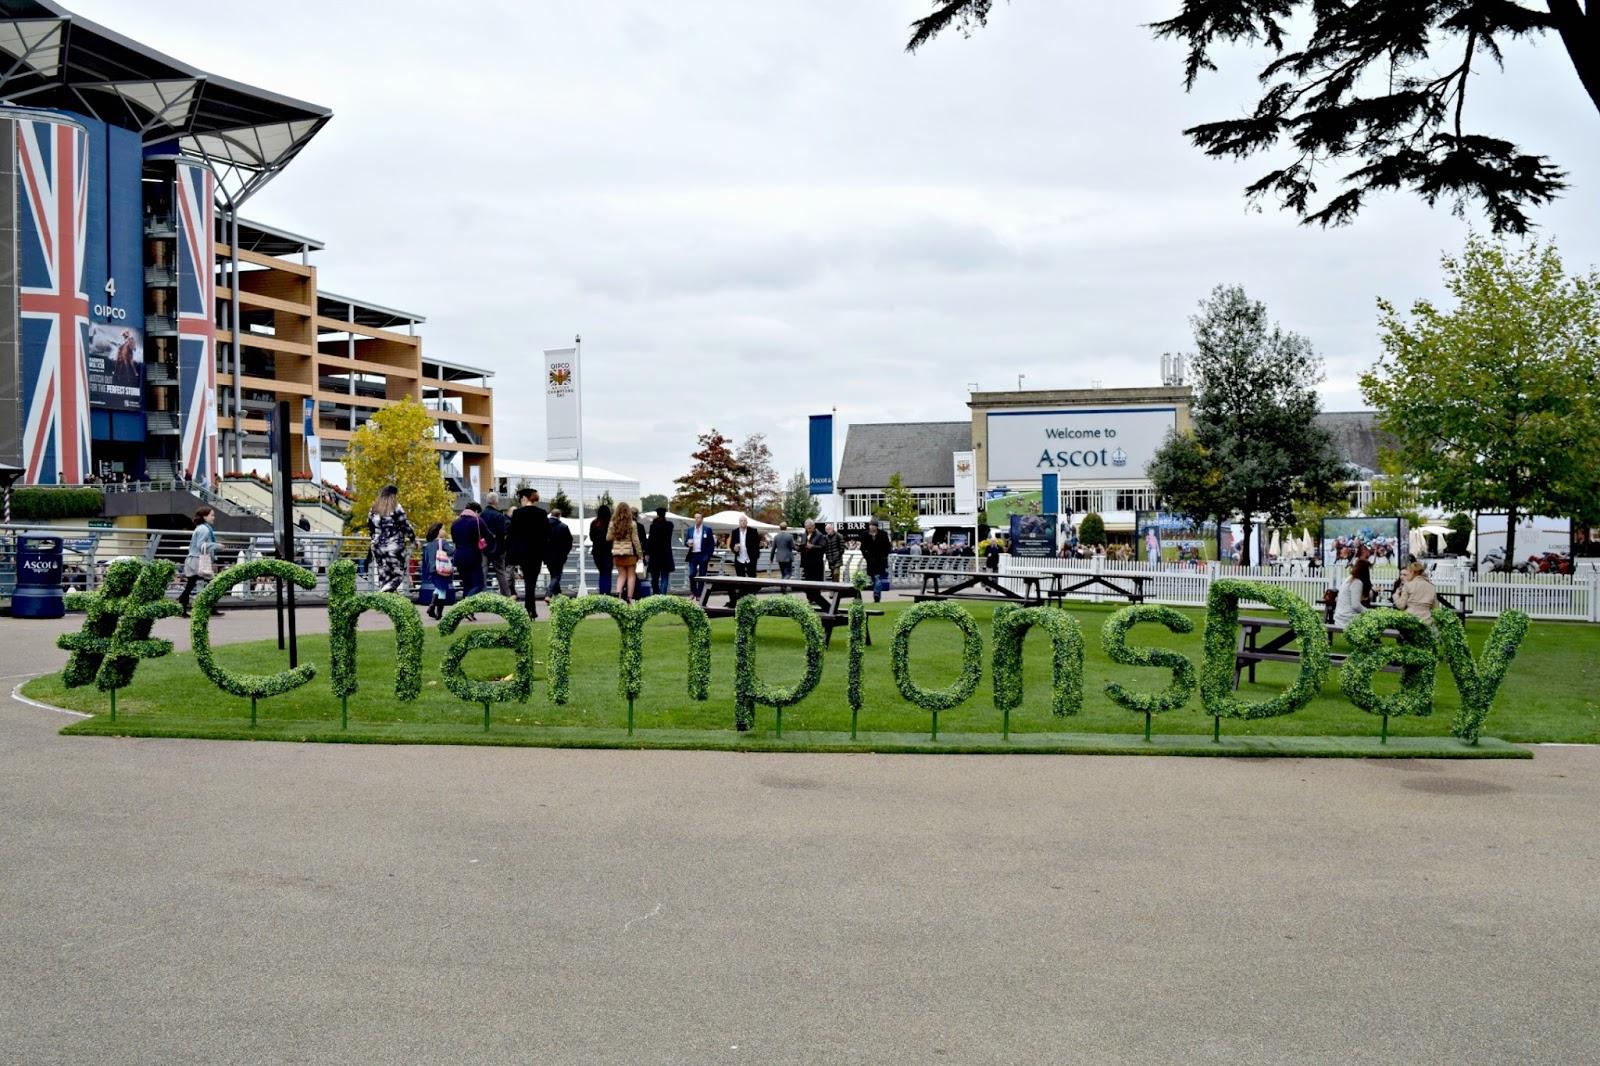 Champions Day at Ascot